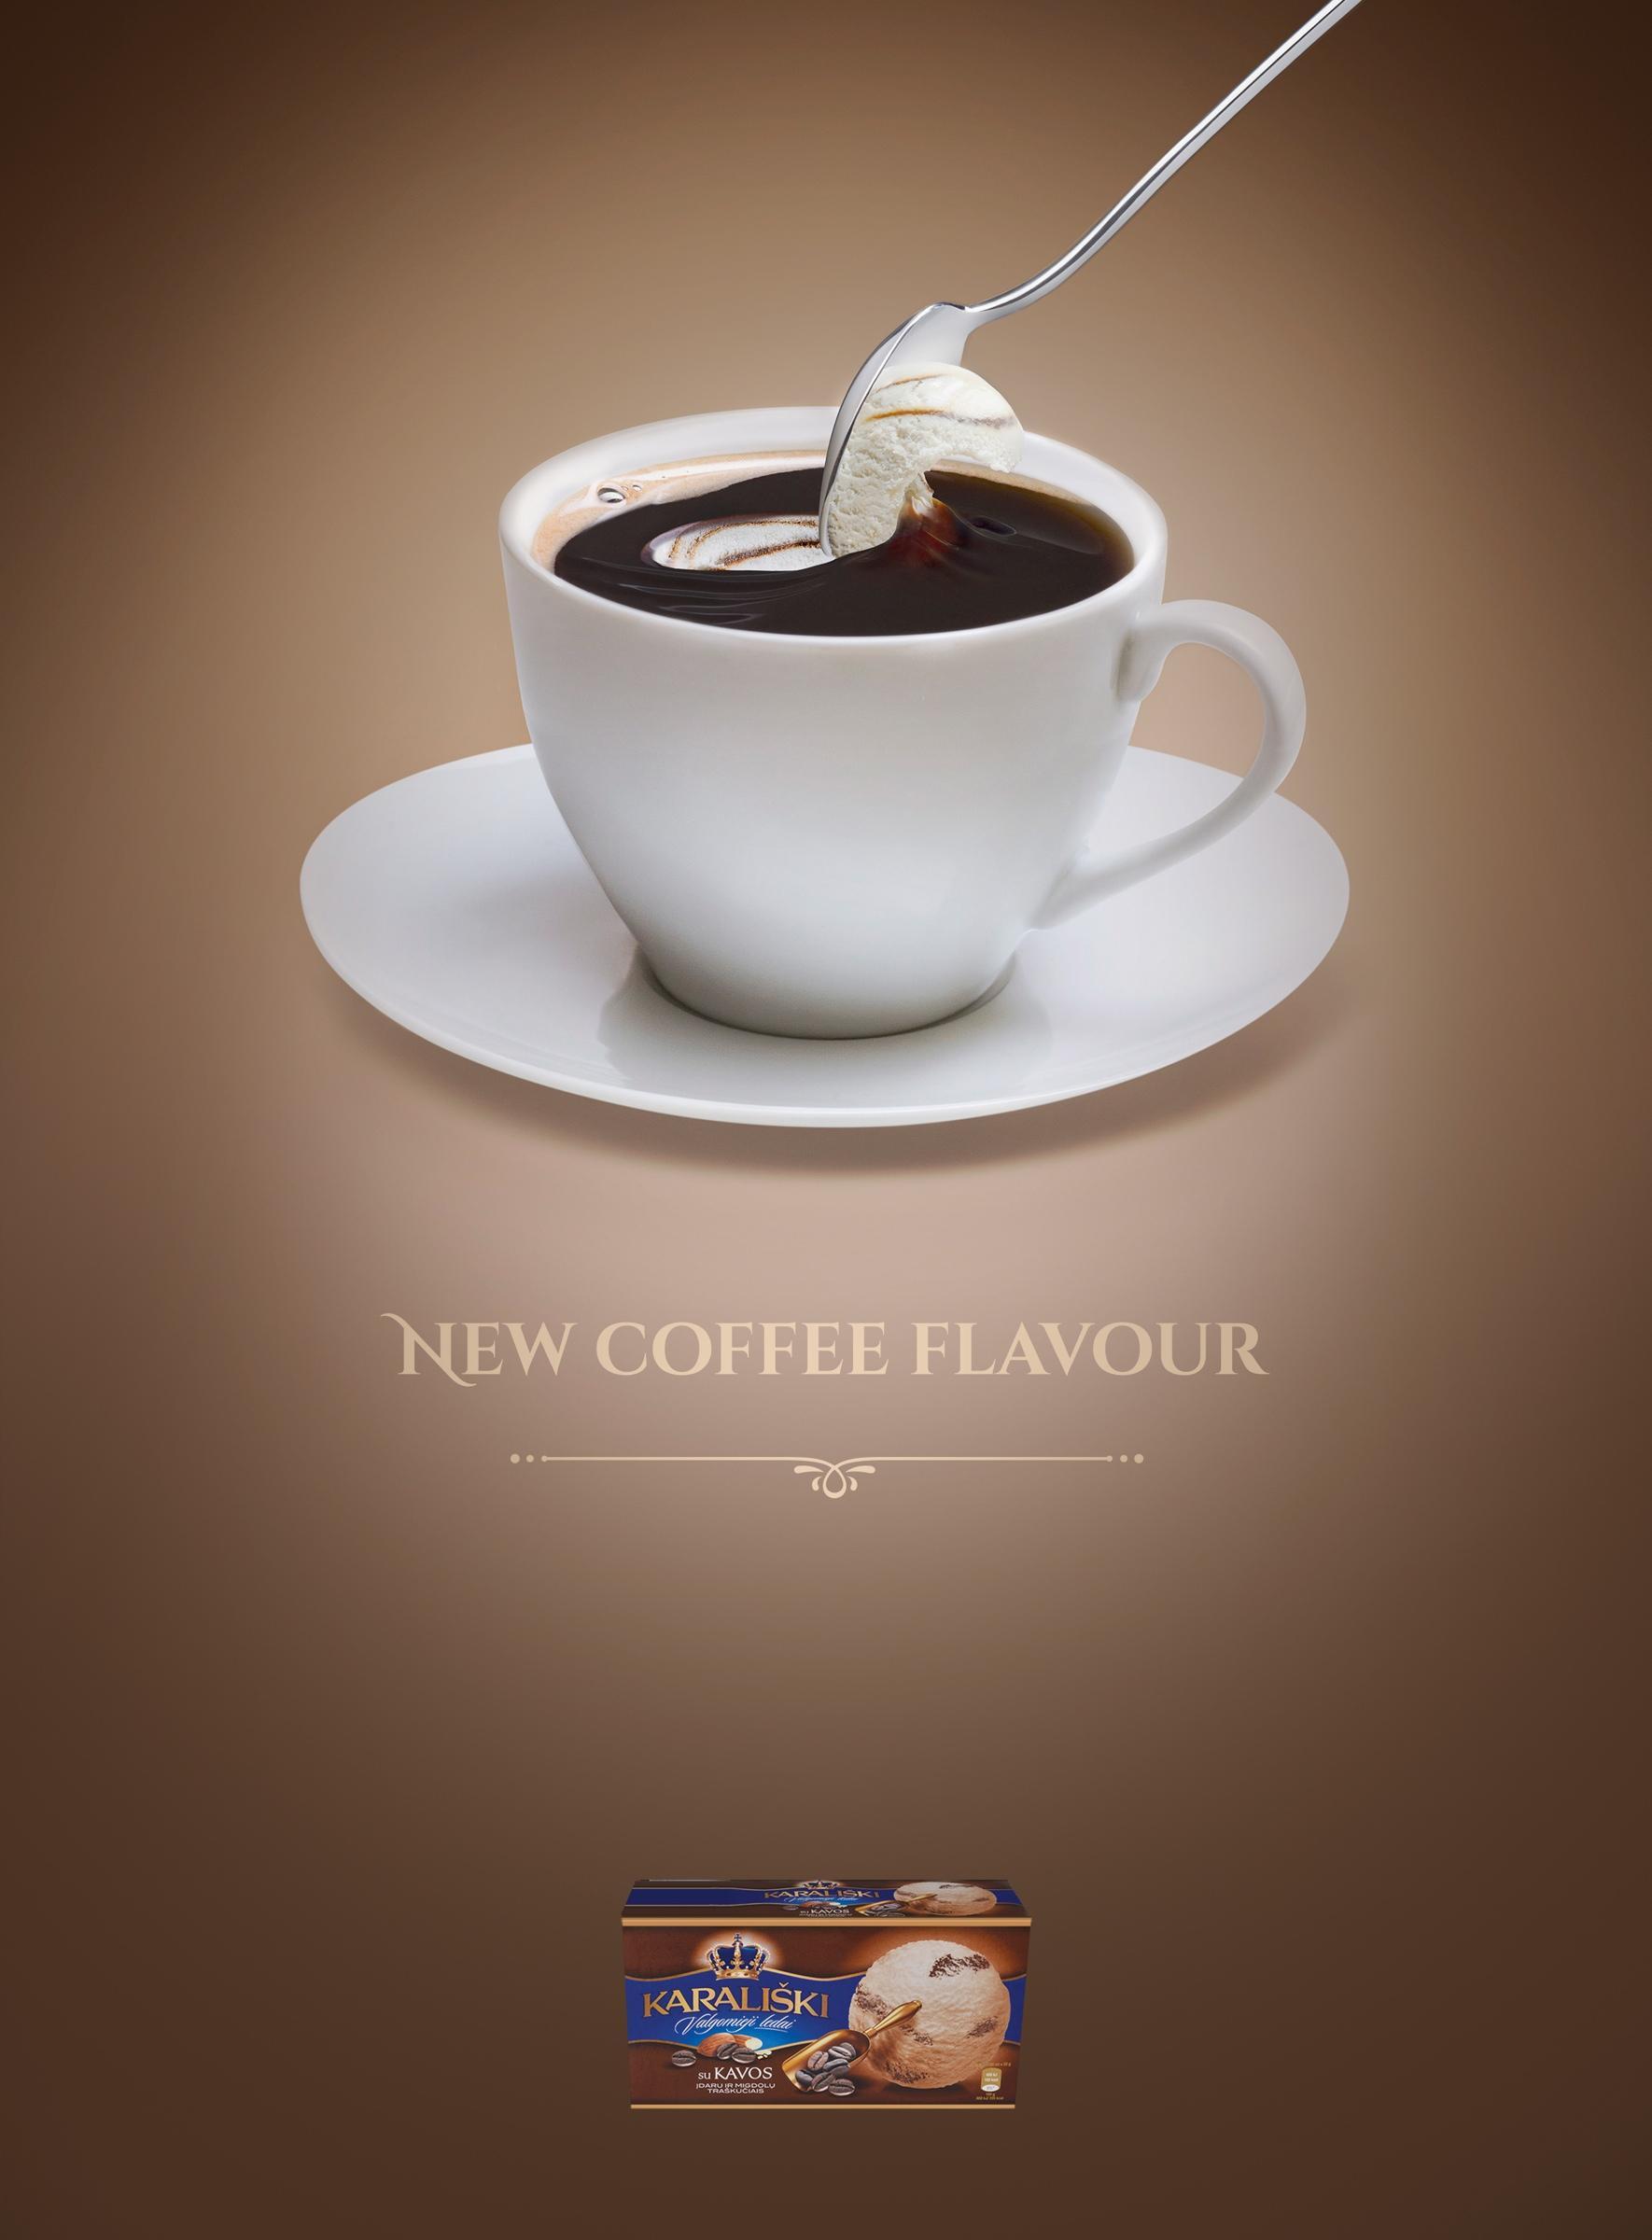 Karaliski:  Coffee